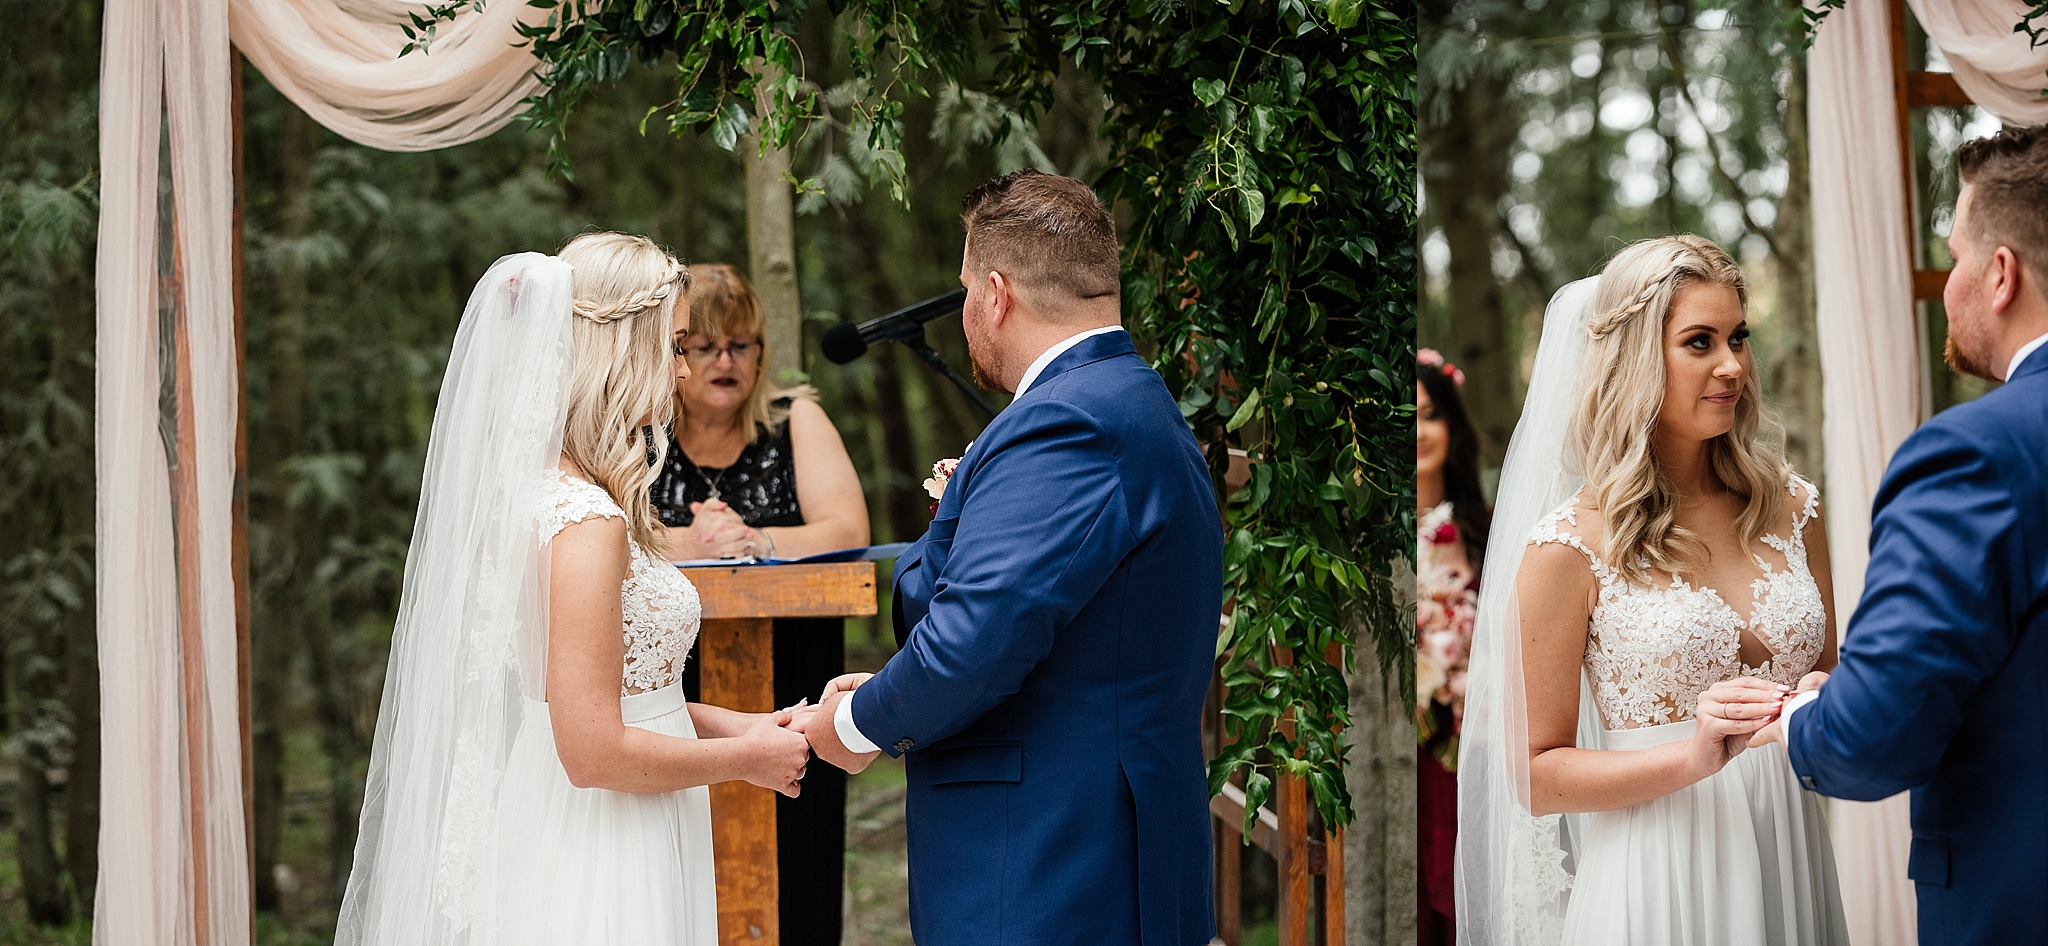 Cape Town Photographer Darren Bester - Die Woud Wedding - Gareth & Roxanne_0022.jpg